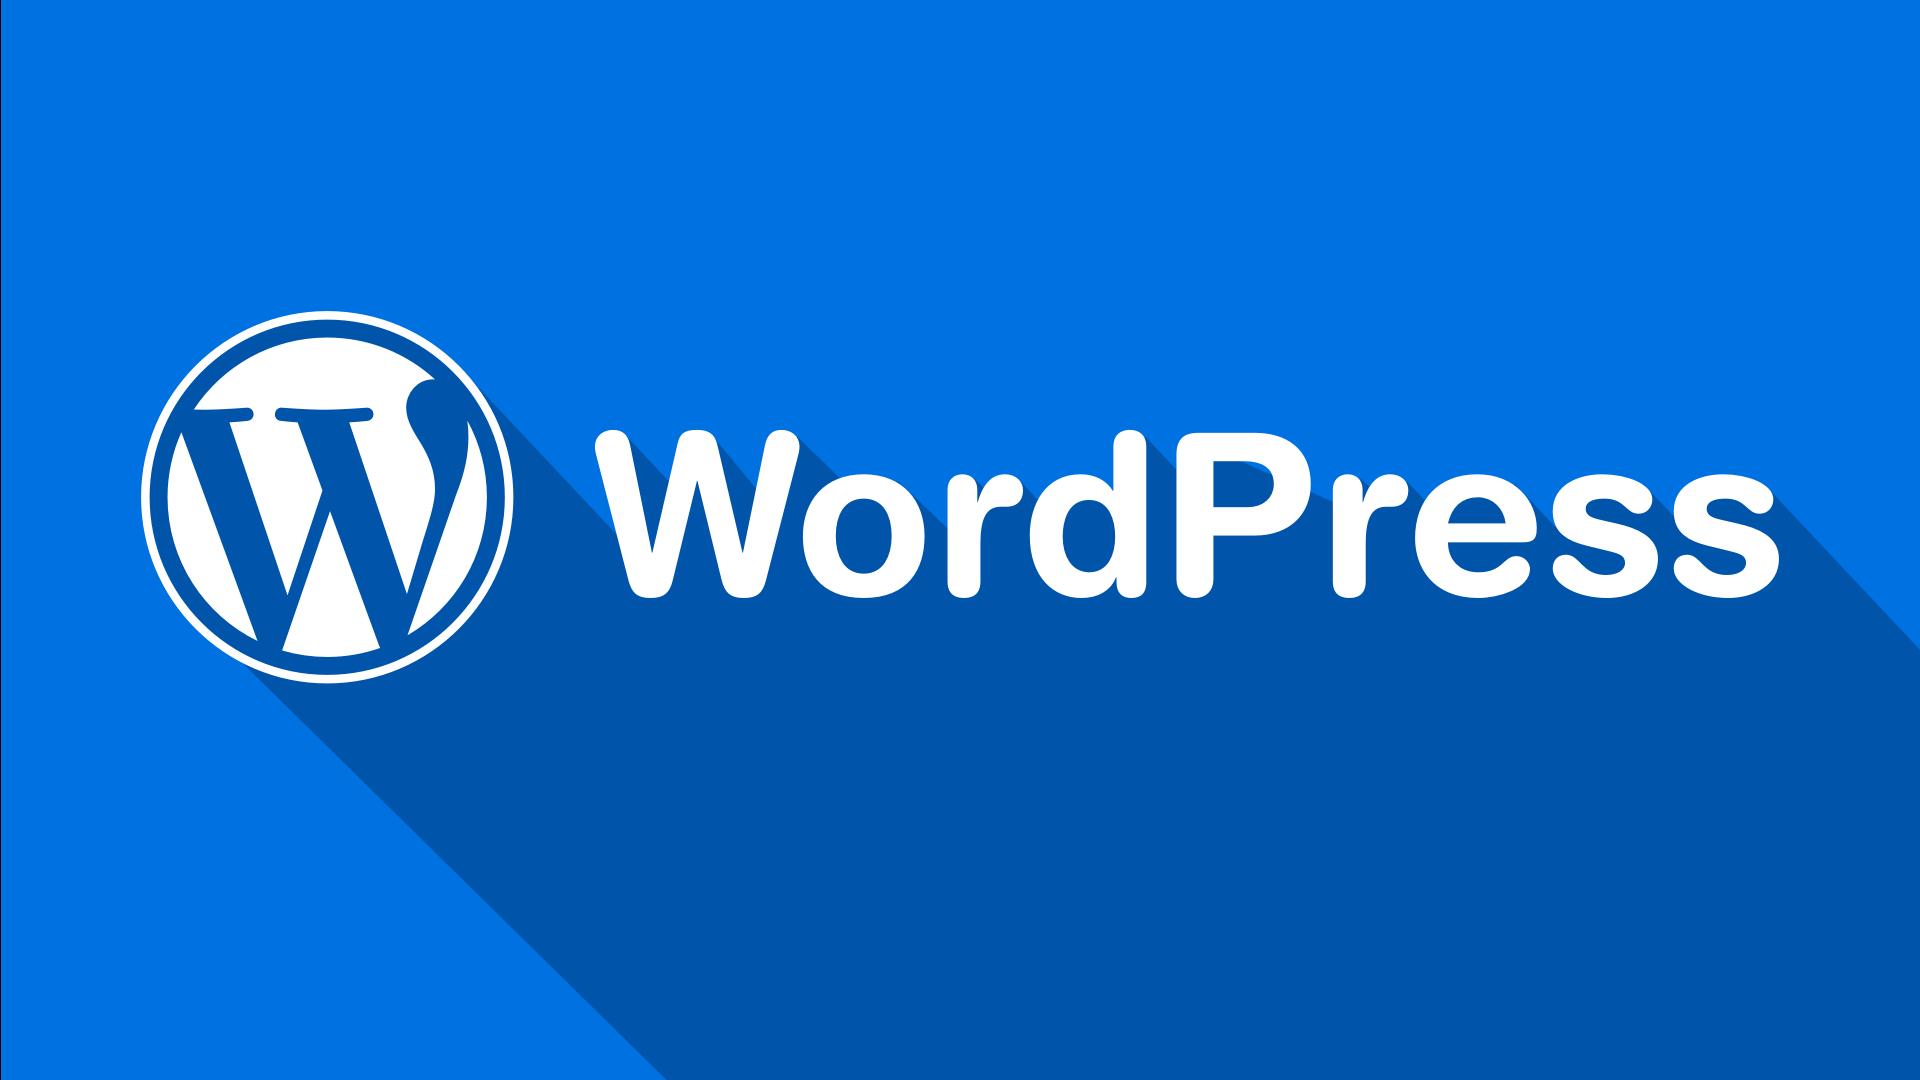 [Update Post]নিয়ে নিন আপনার WordPress সাইটের জন্য সন্দুর একটি মোবাইল  Themes.